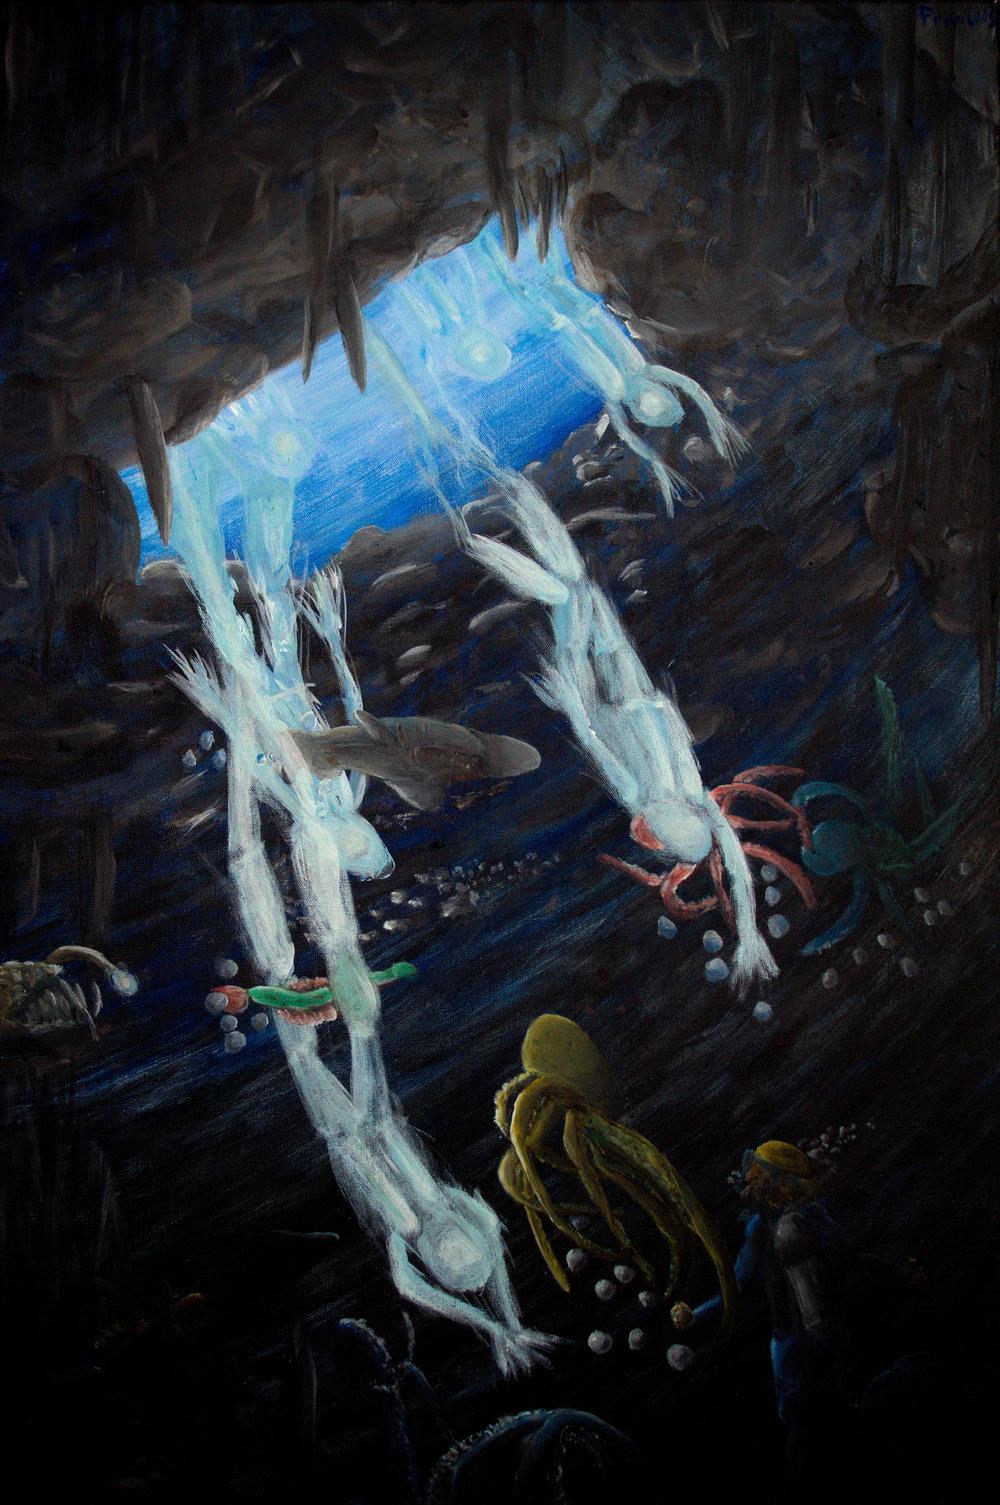 The Cavernous, Esoteric Depths